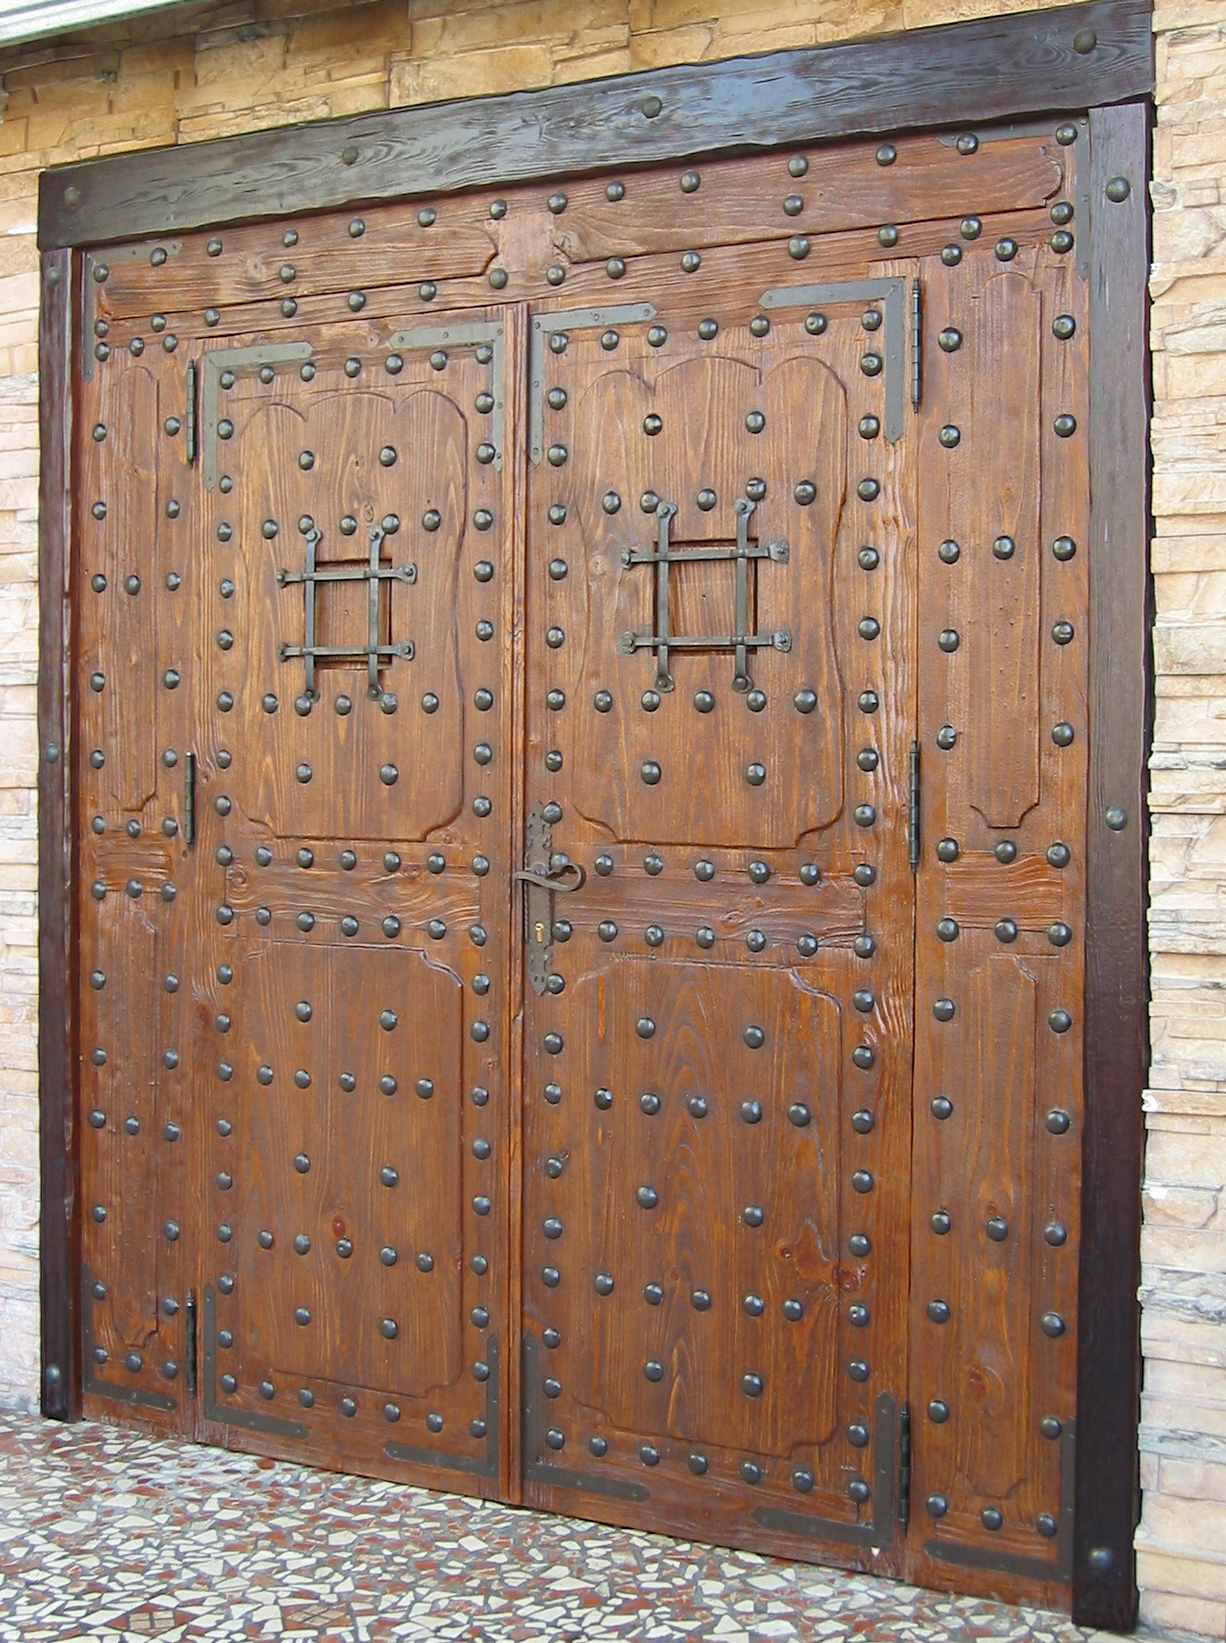 Puerta de dos hojas de madera con veta chorro de arena